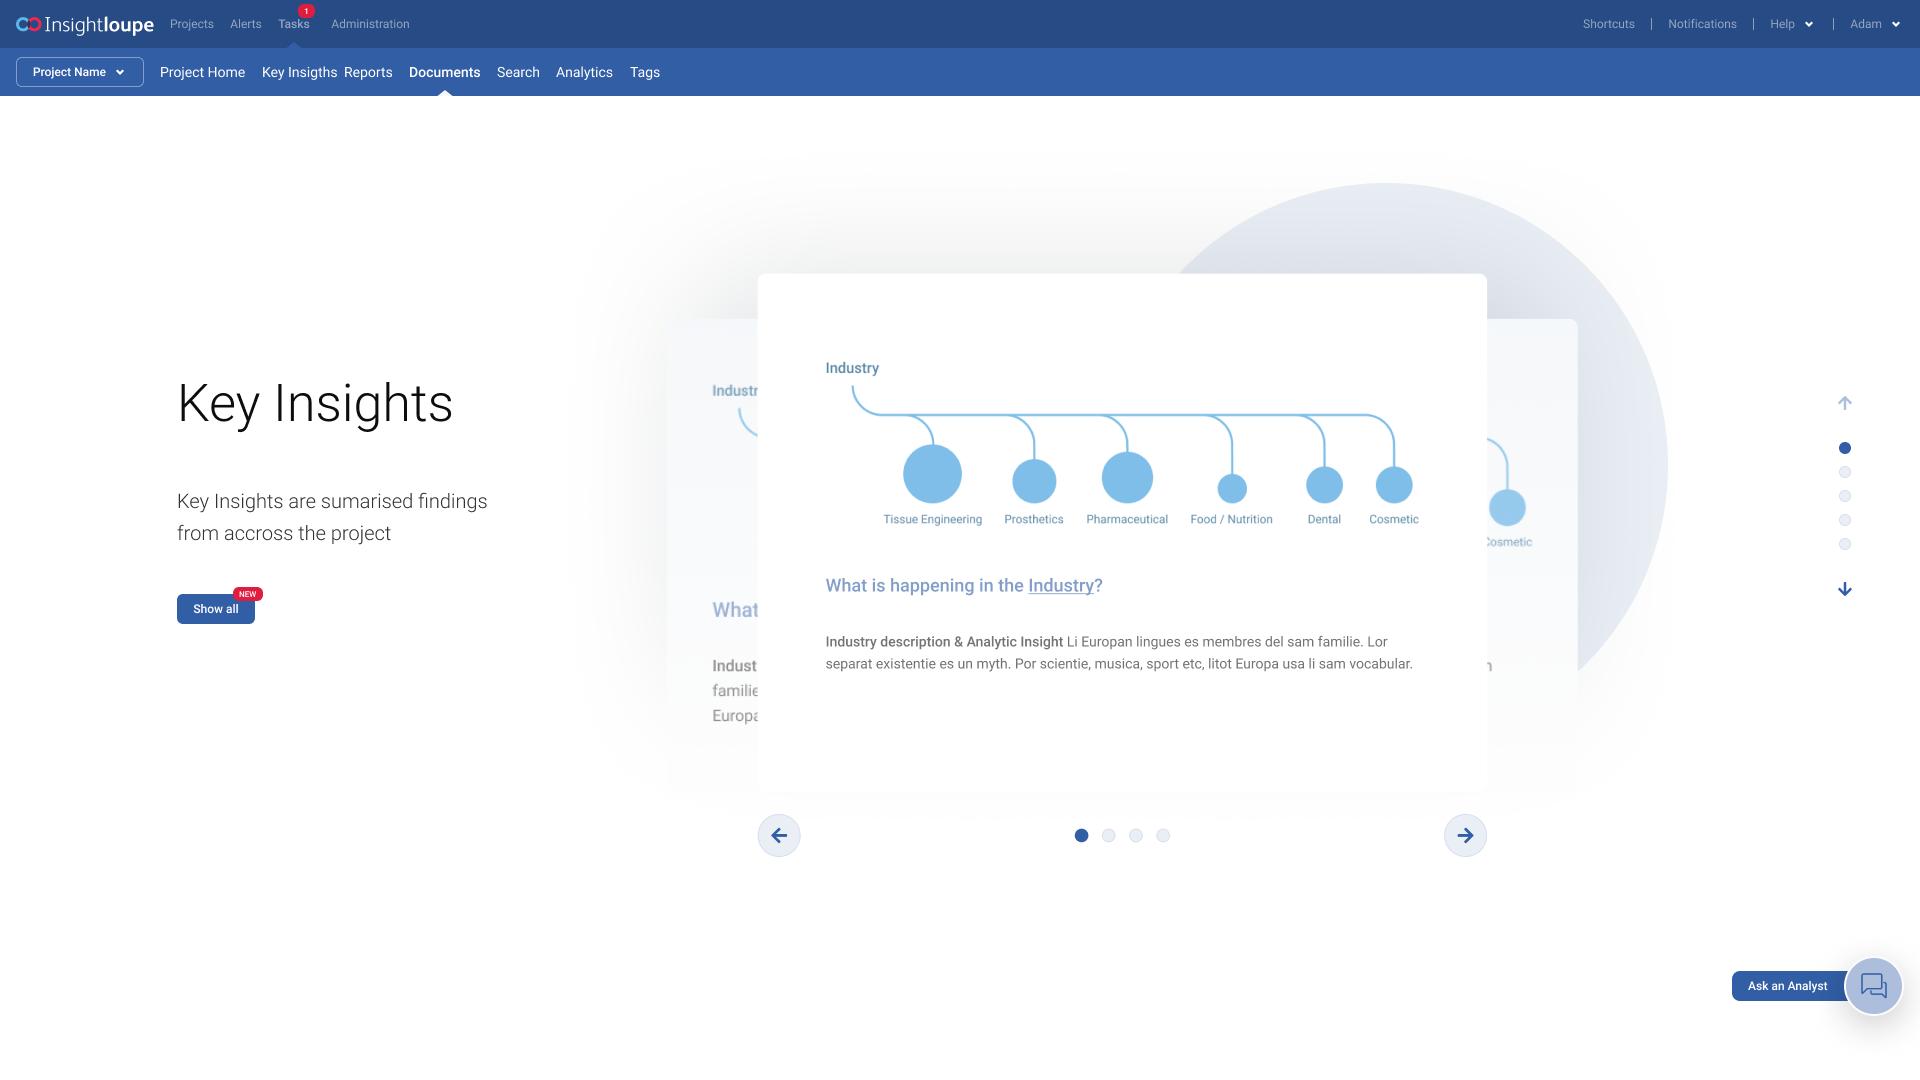 UX/UI Redesign, Scrum best practices implementation - Evalueserve - Case Study